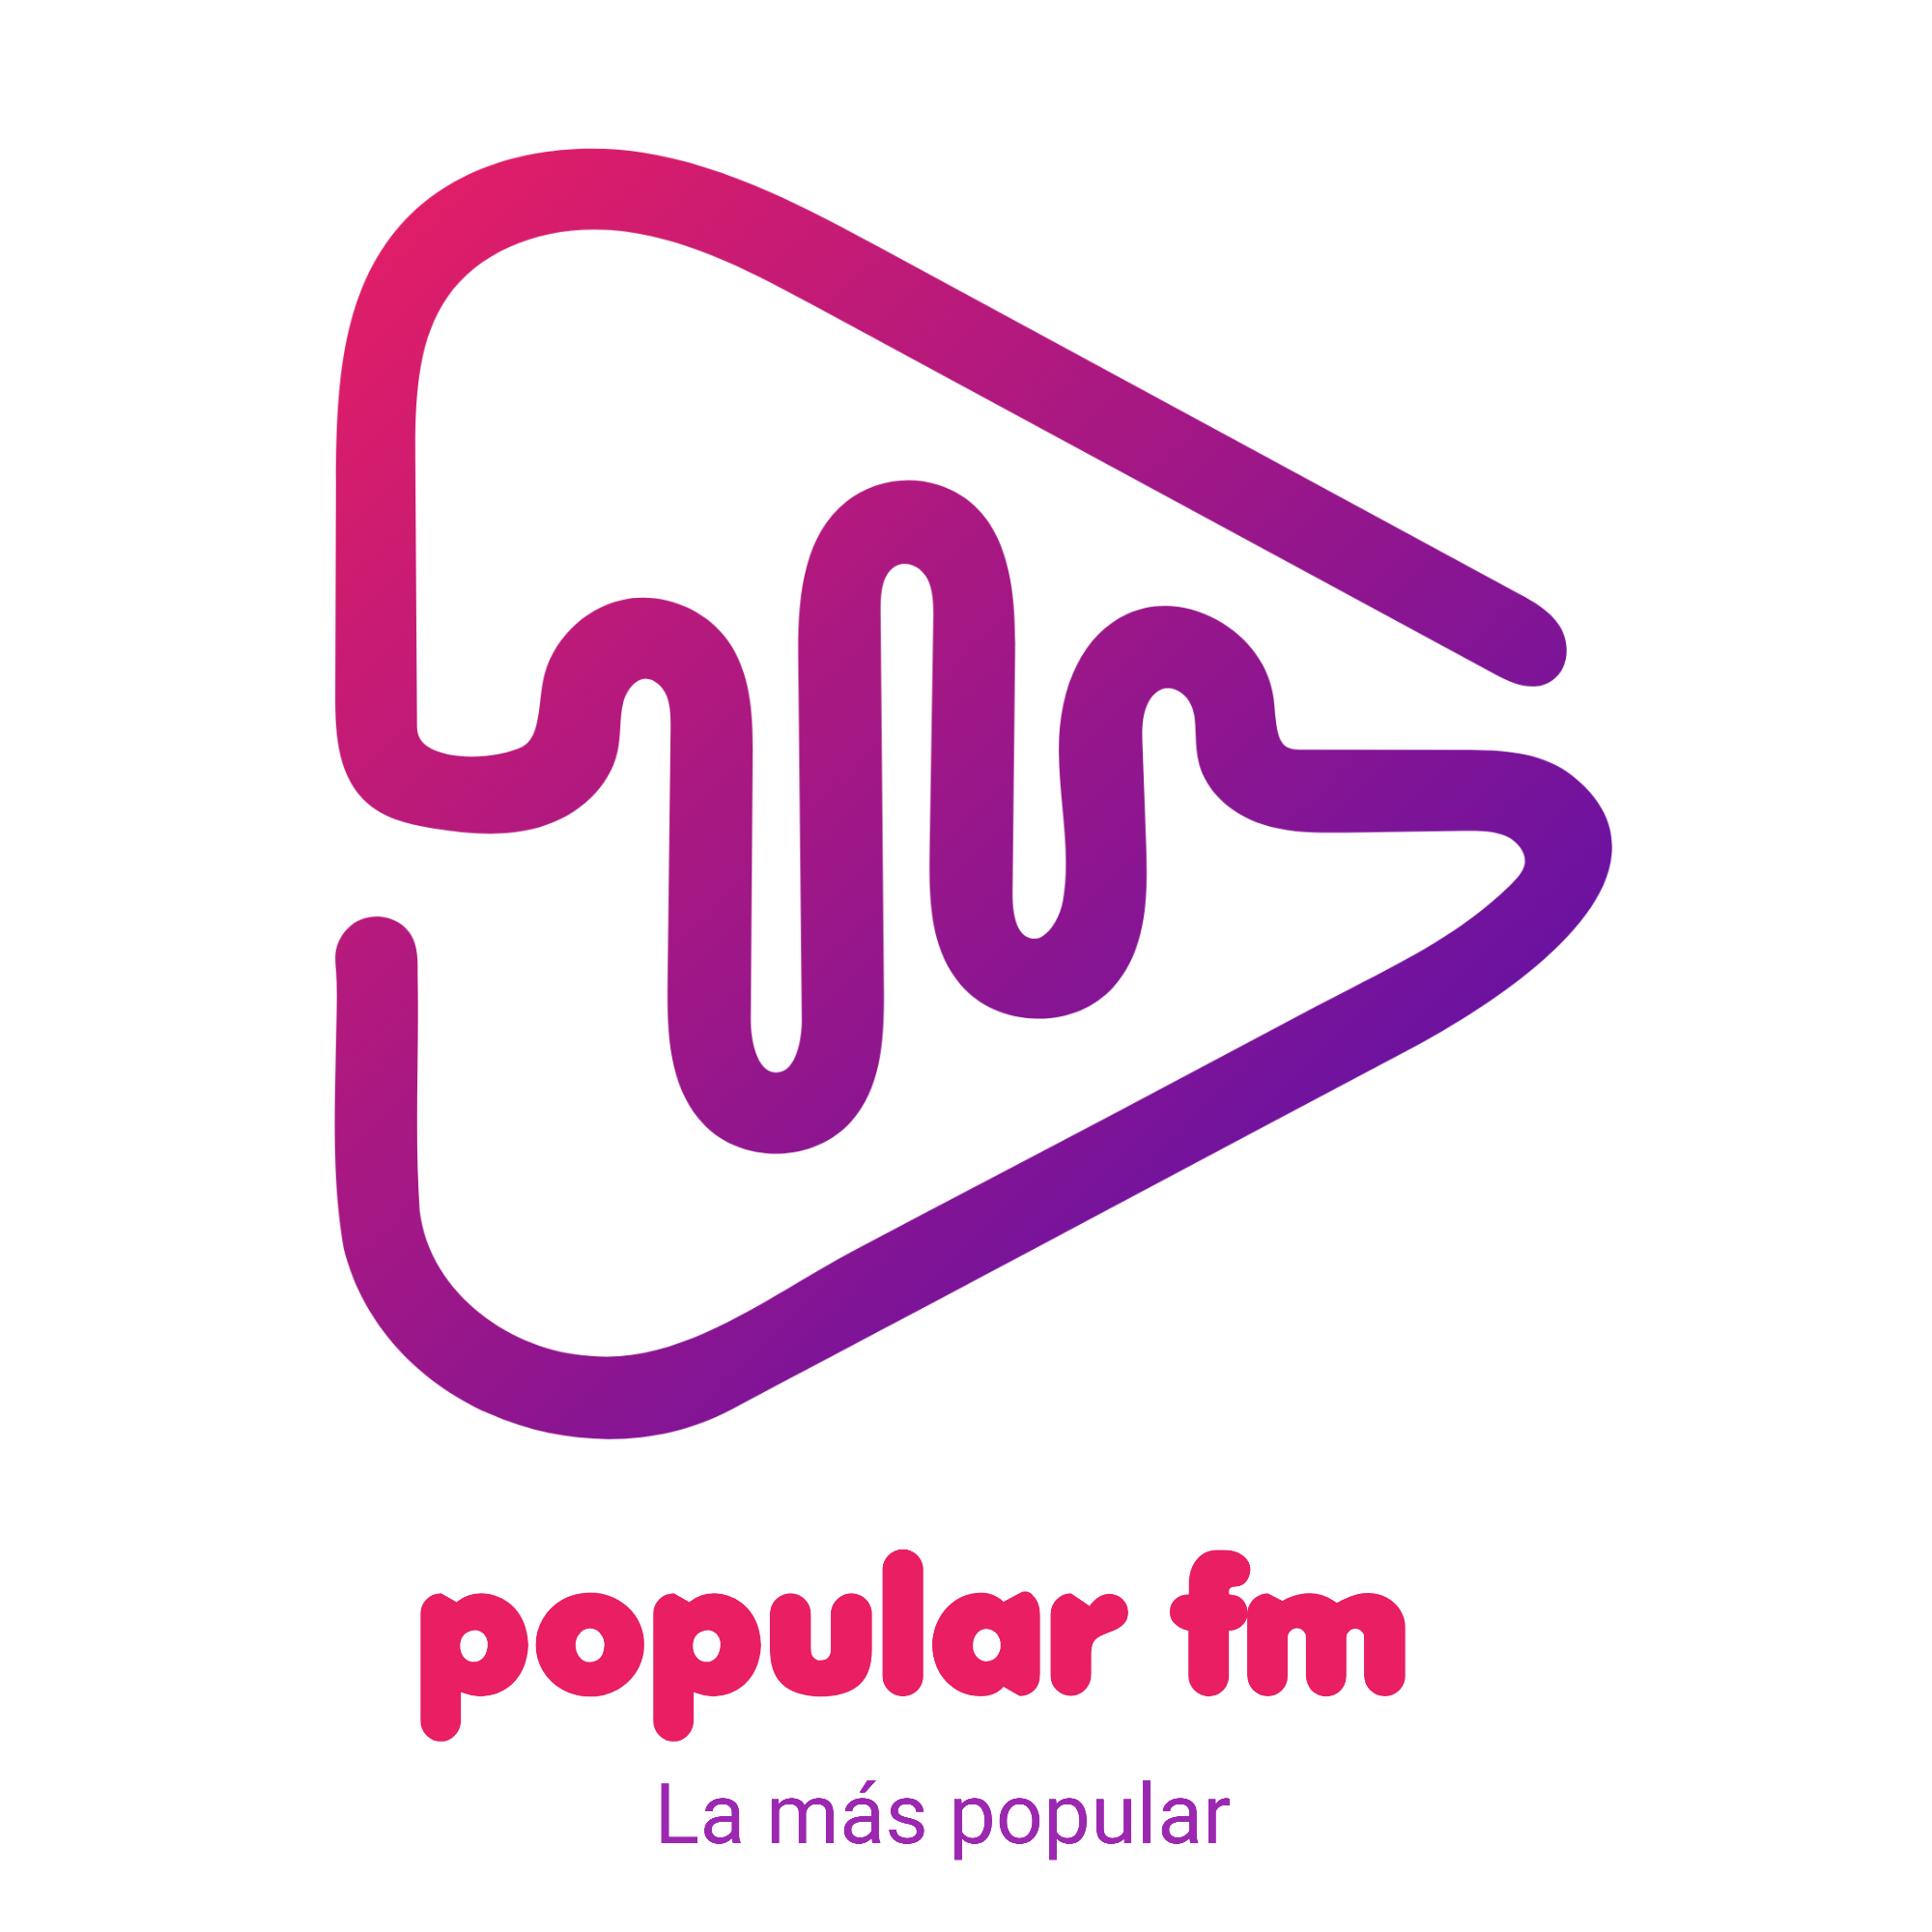 Popular Fm - La mas popular